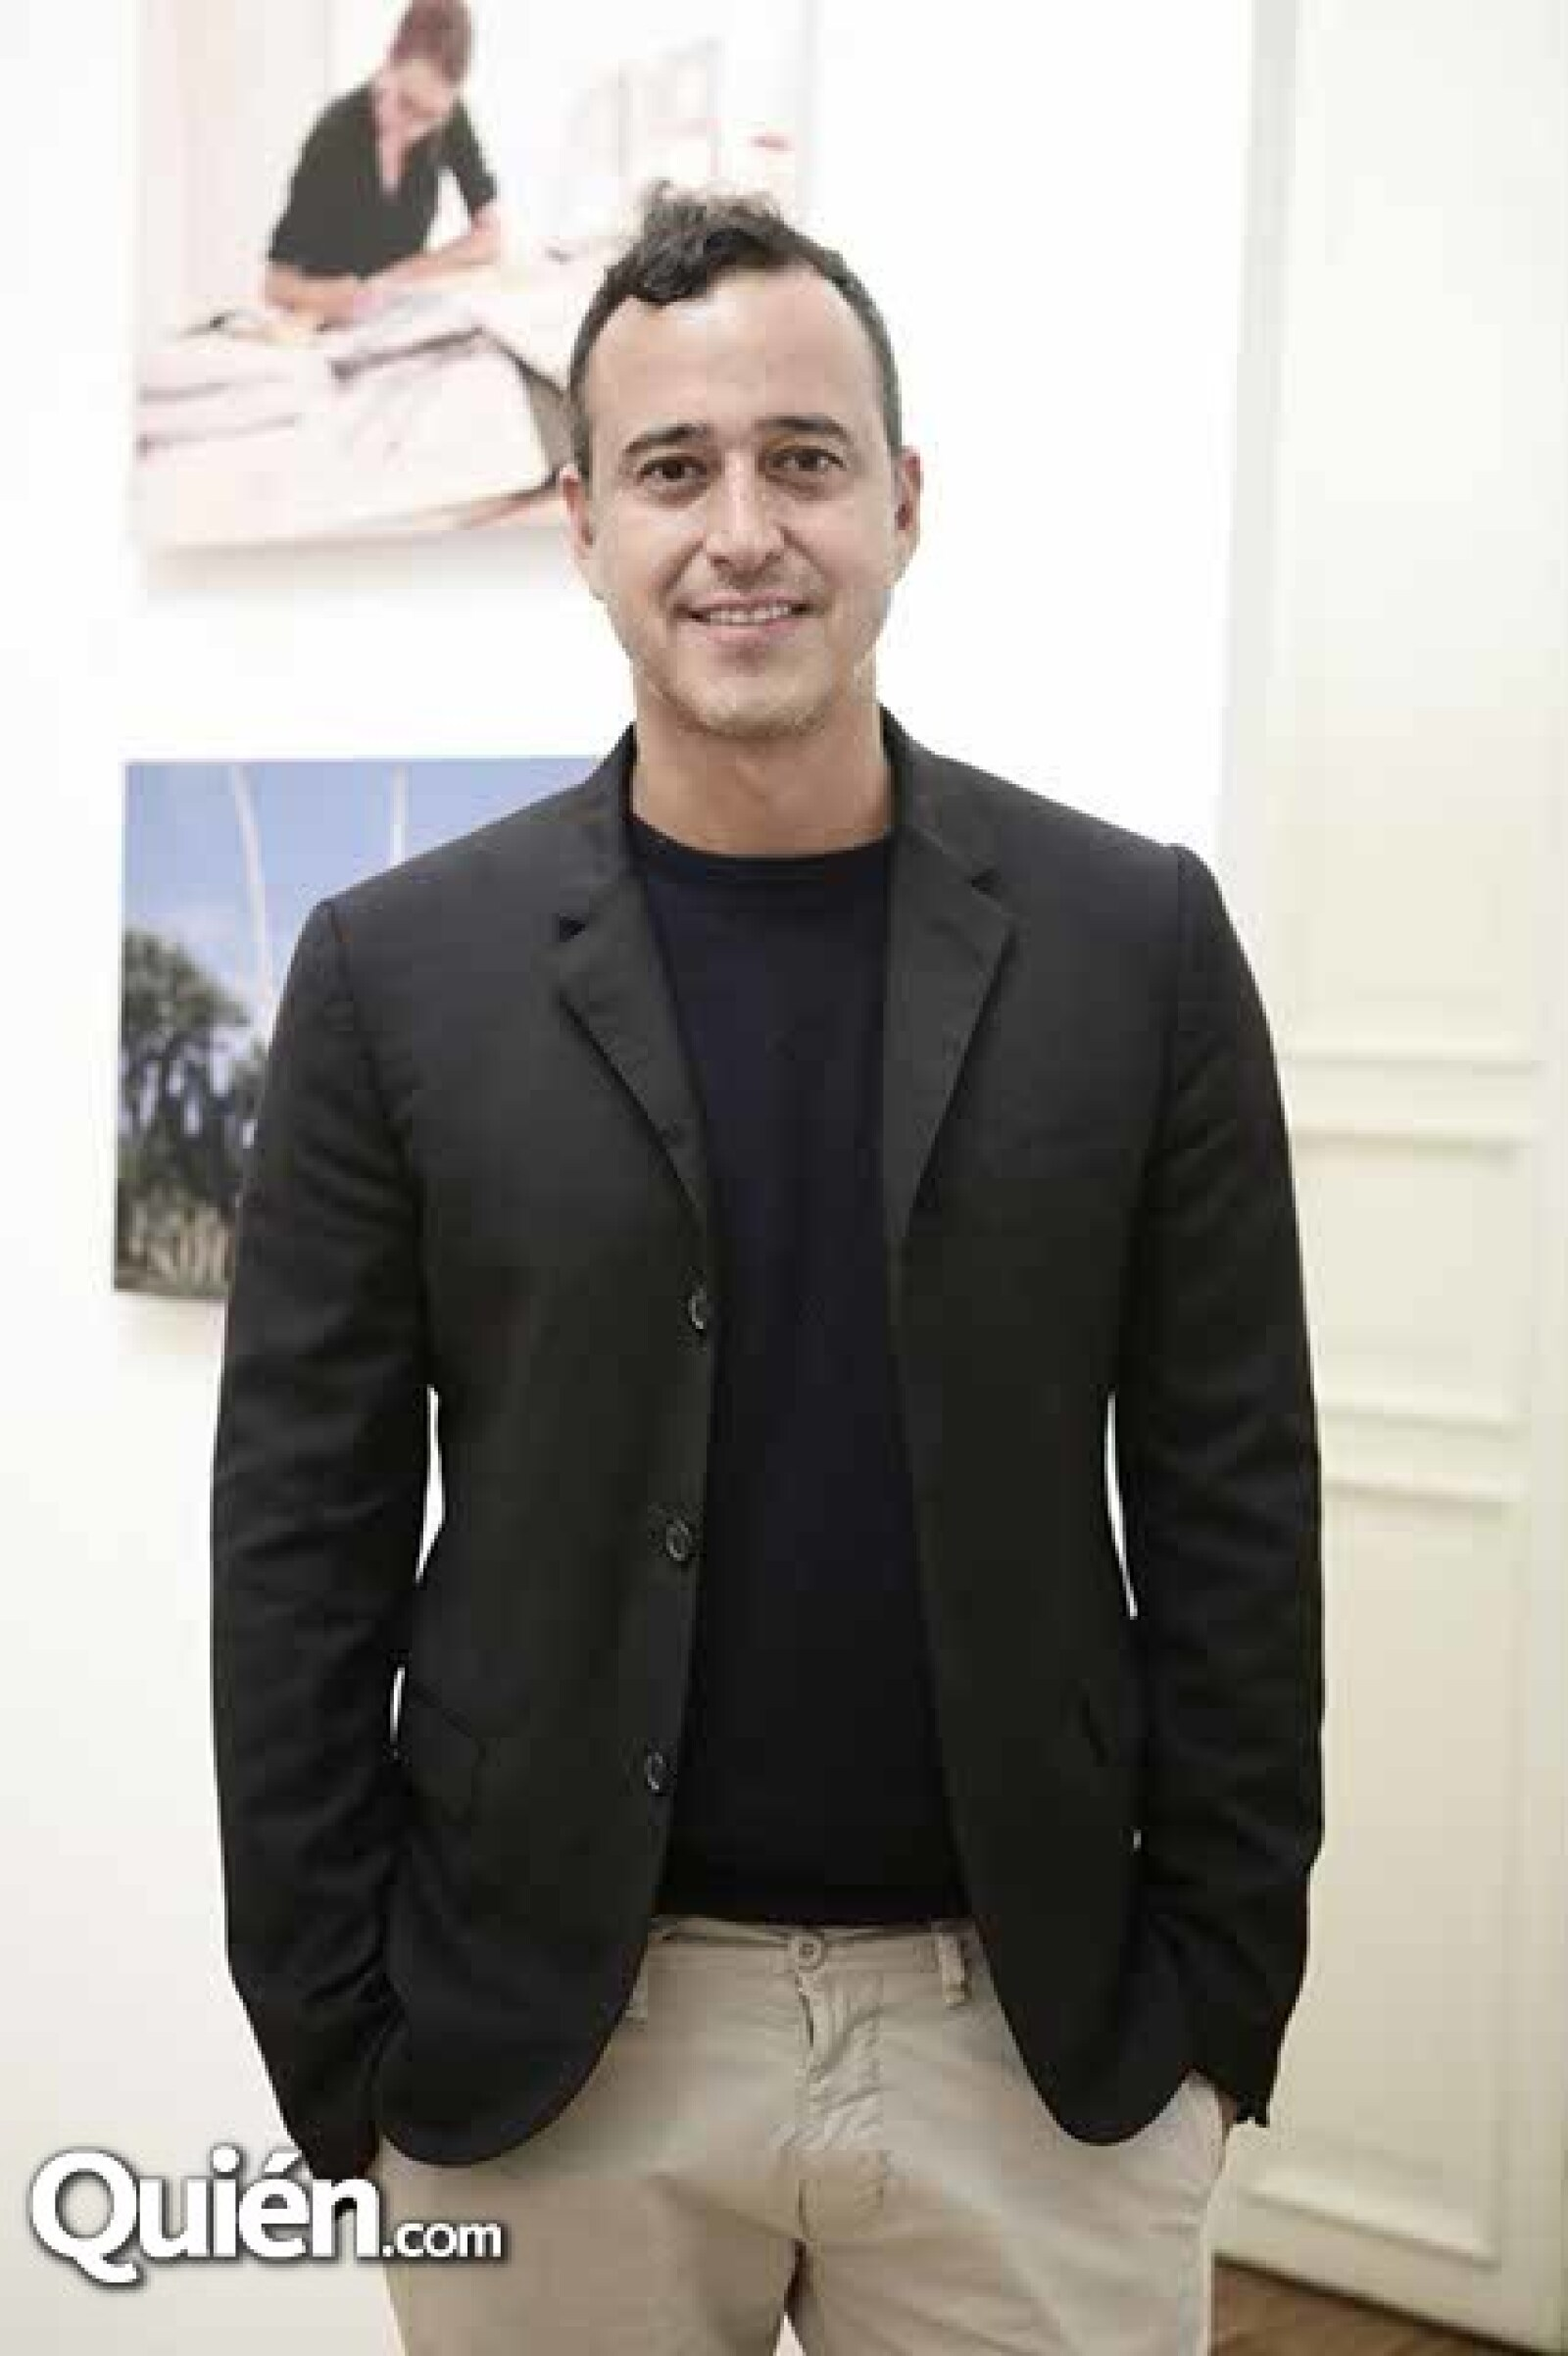 Alexander Barrios